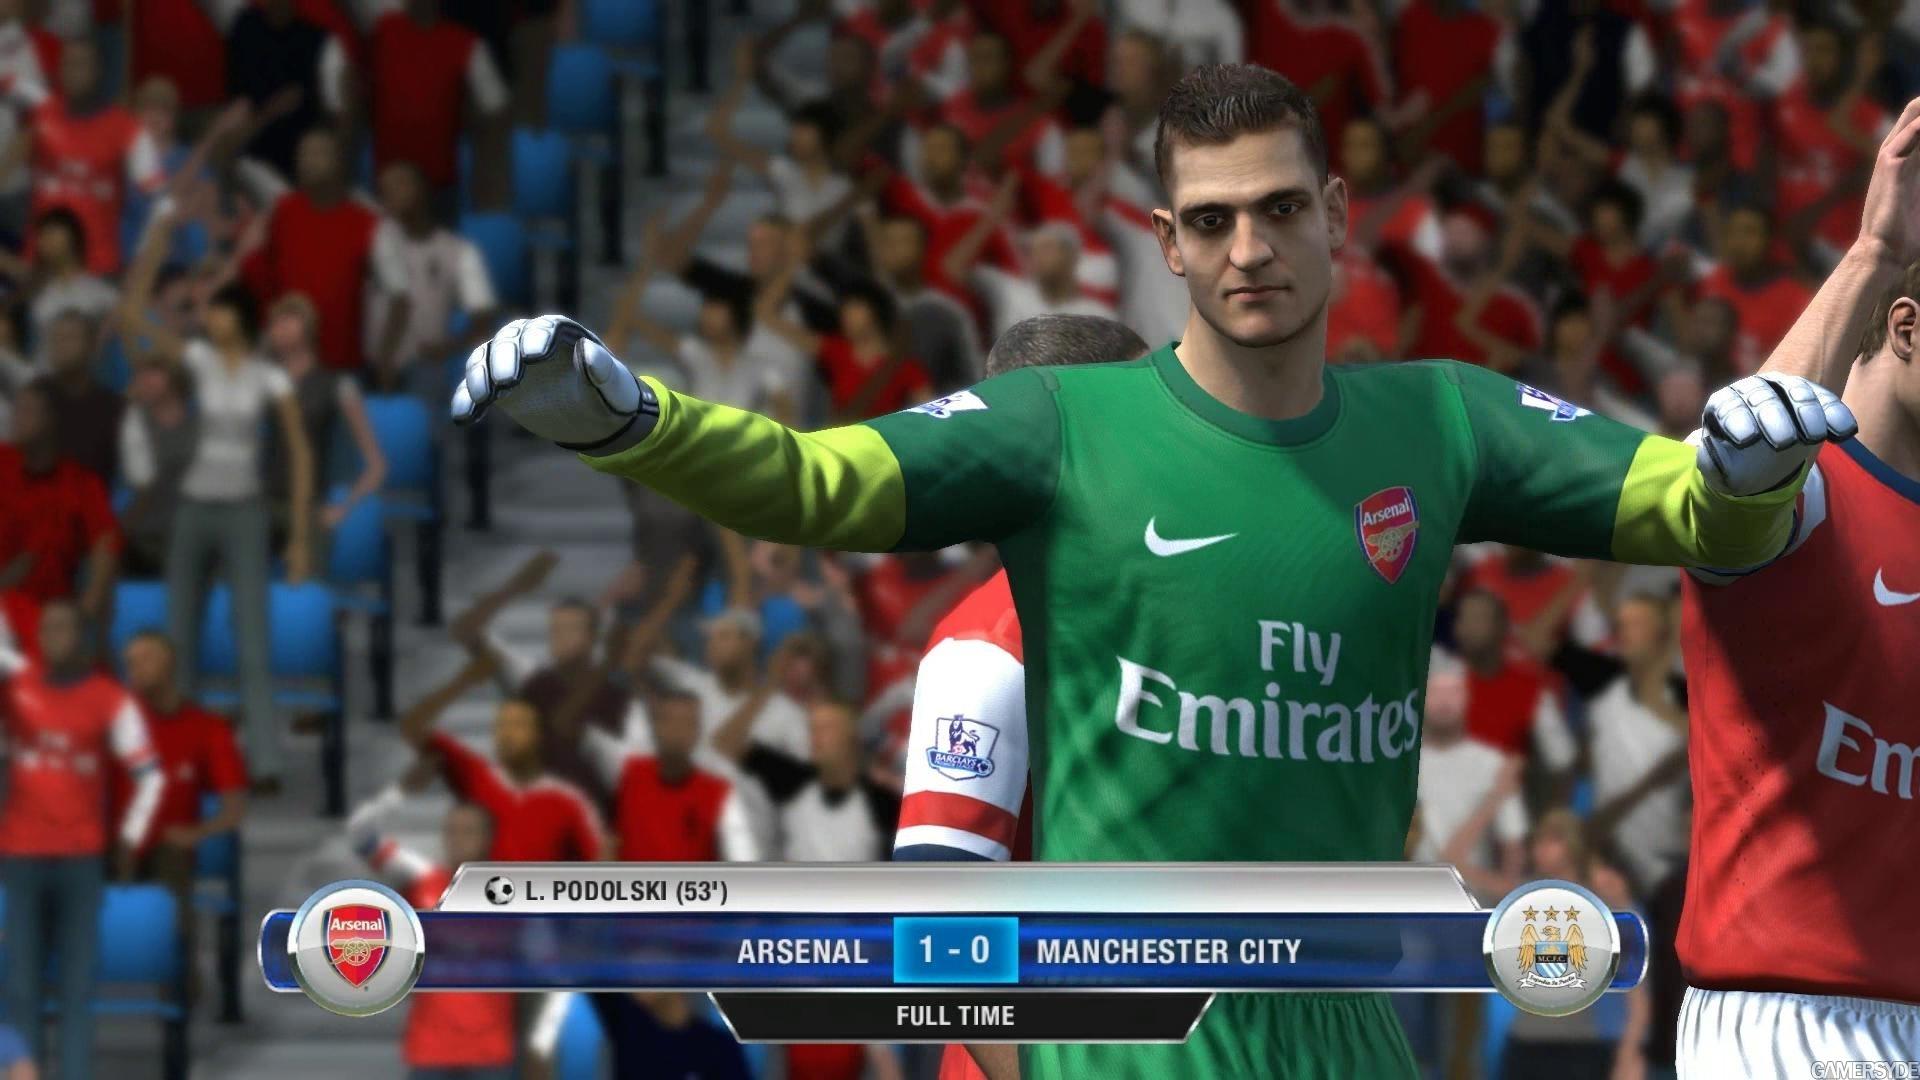 image fifa 13 20263 2509 0011 تصاویر جدید از بازی FIFA 13